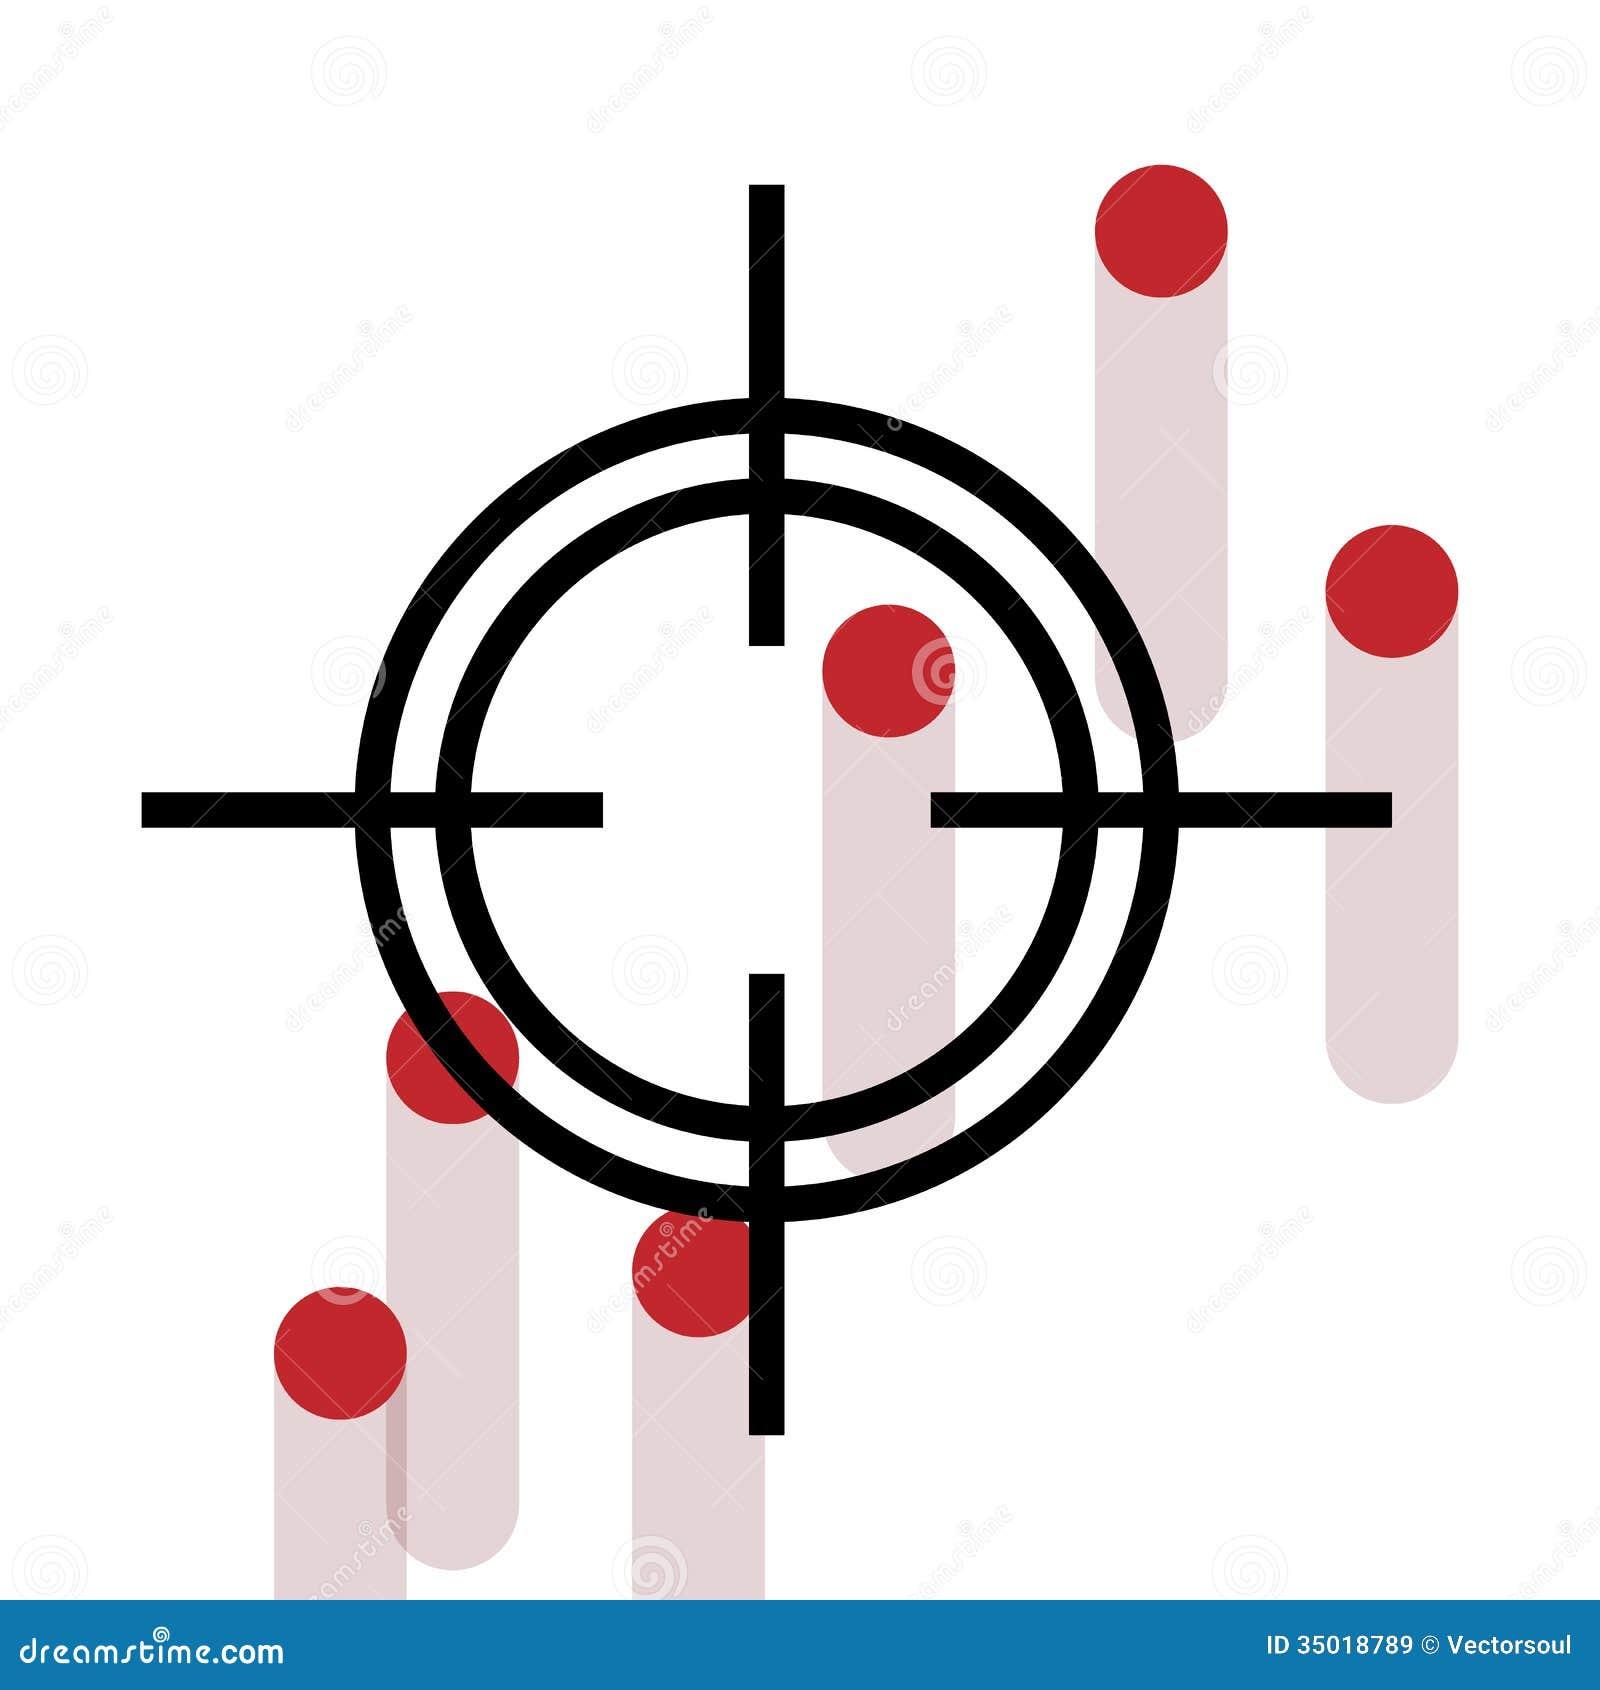 Crosshairs Clip Art Source Http Imgkid Com Crosshairs Clip Art Shtml